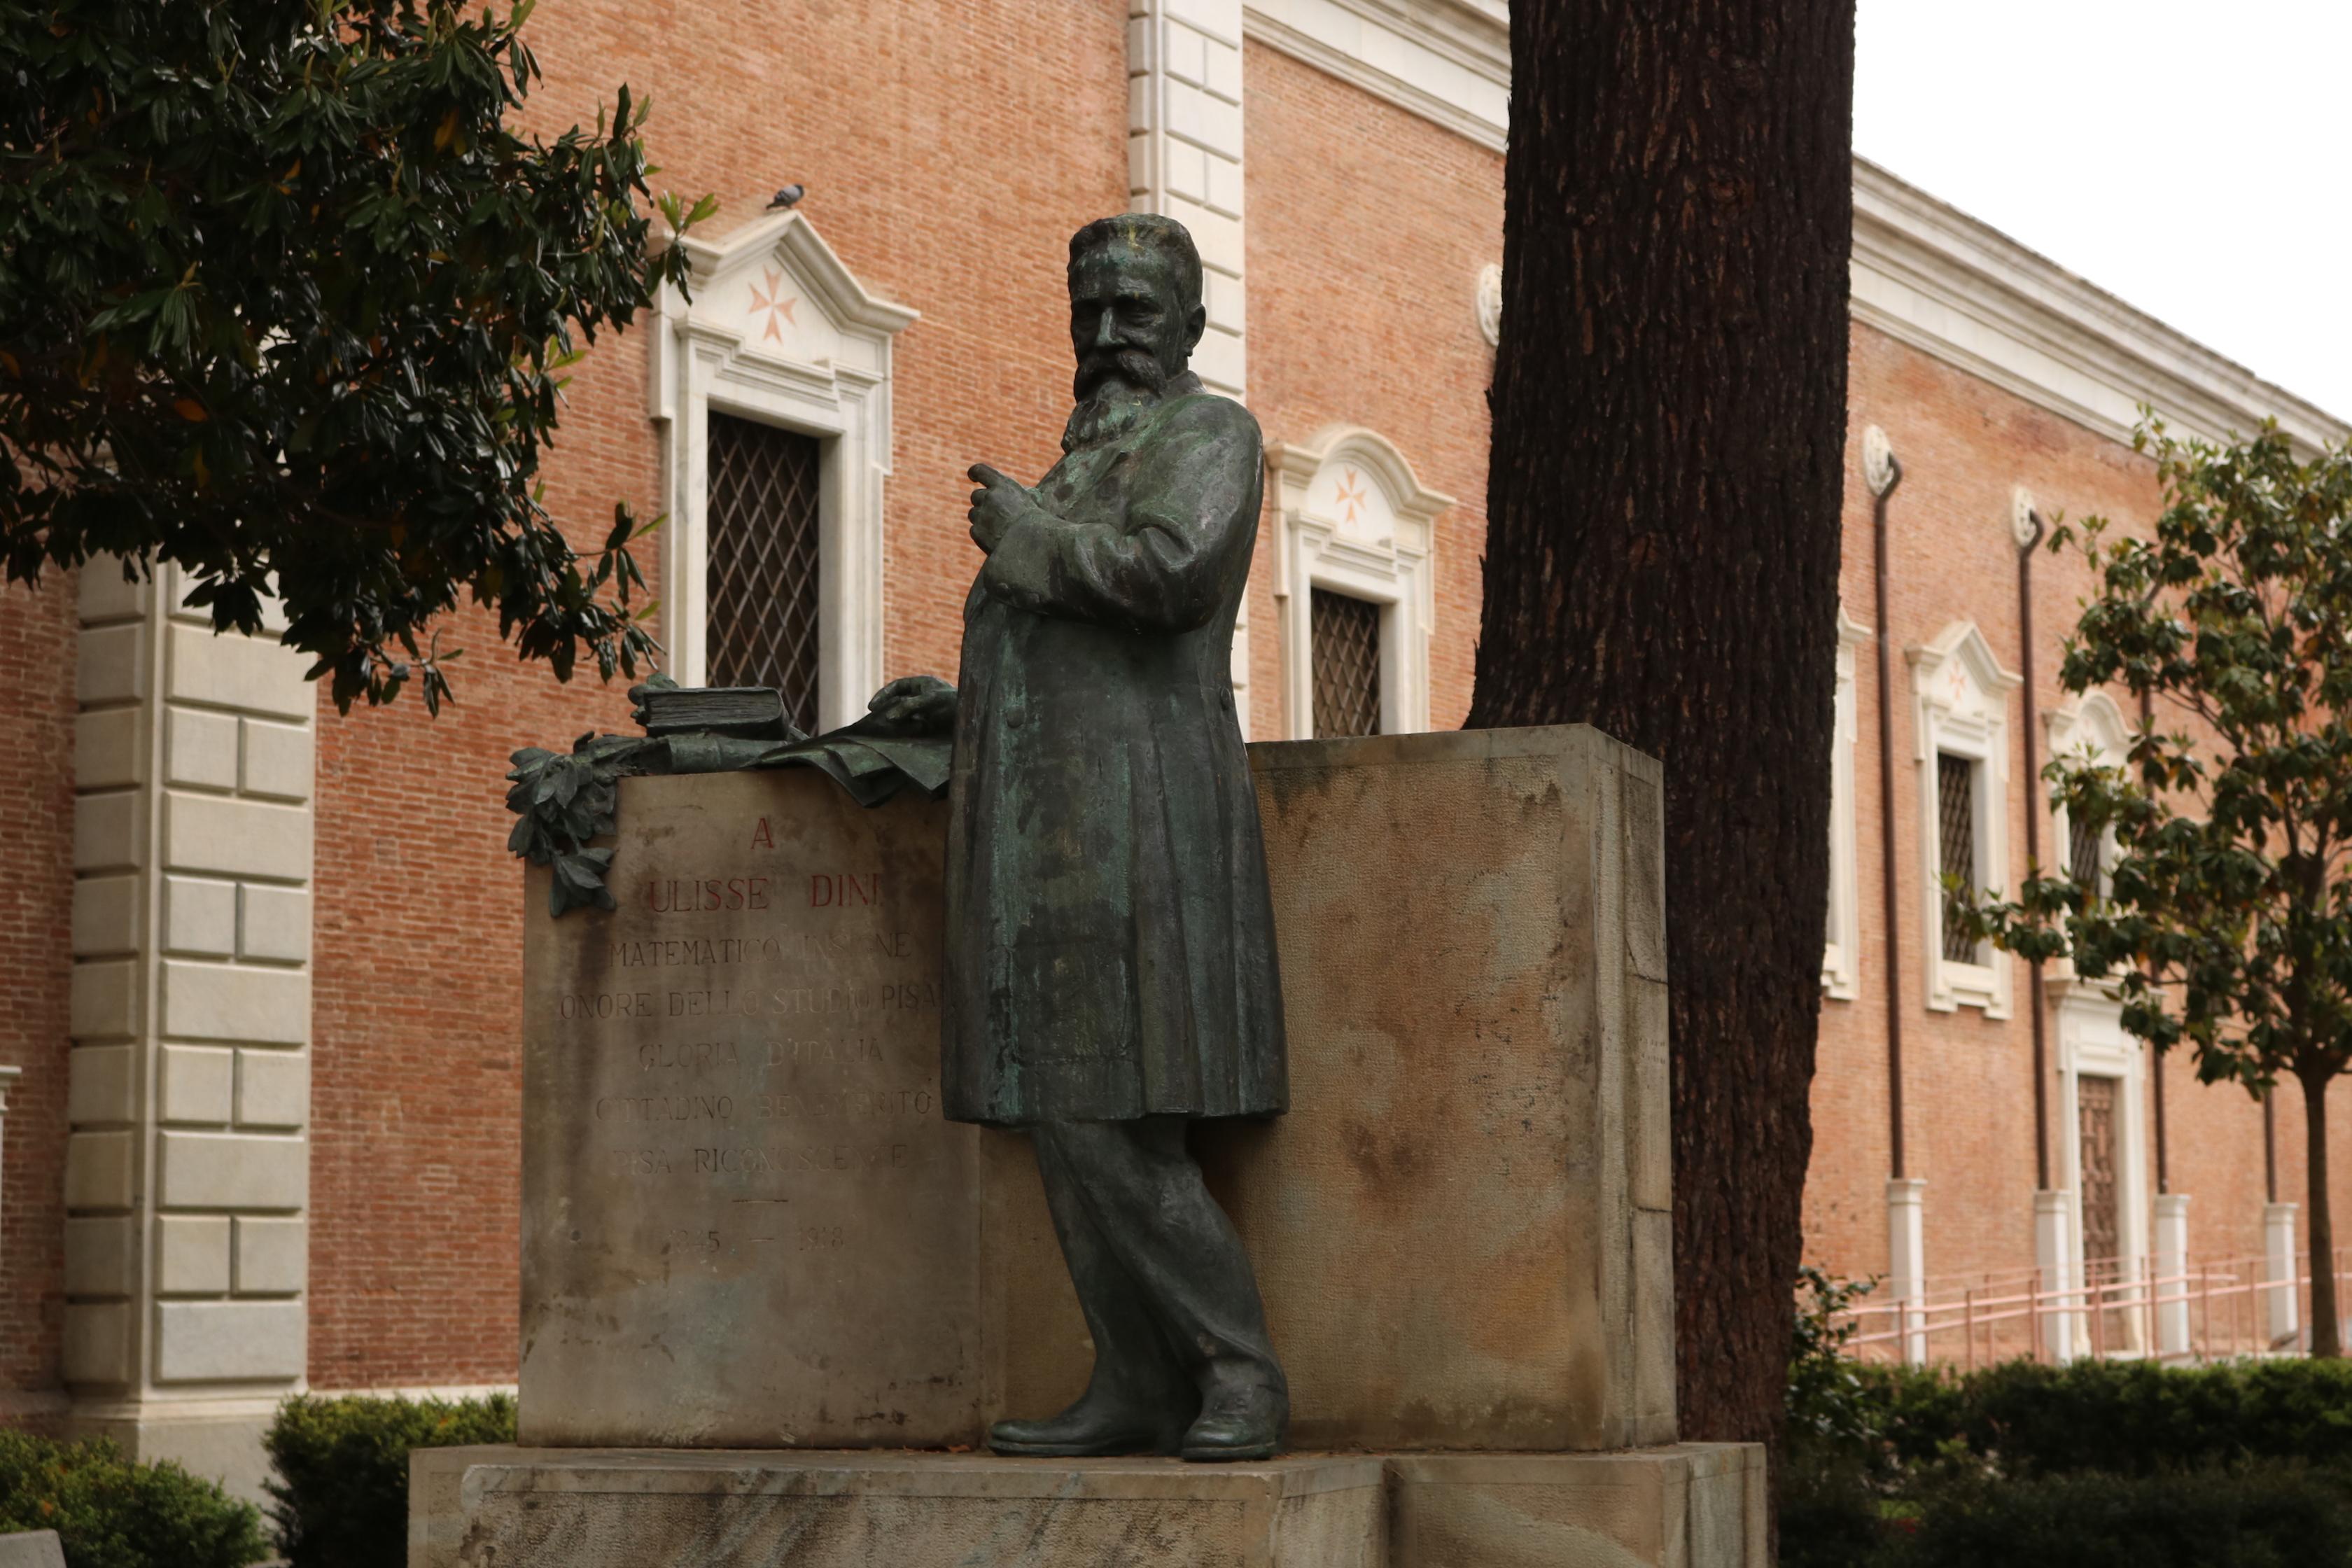 Statua - Via Ulisse Dini